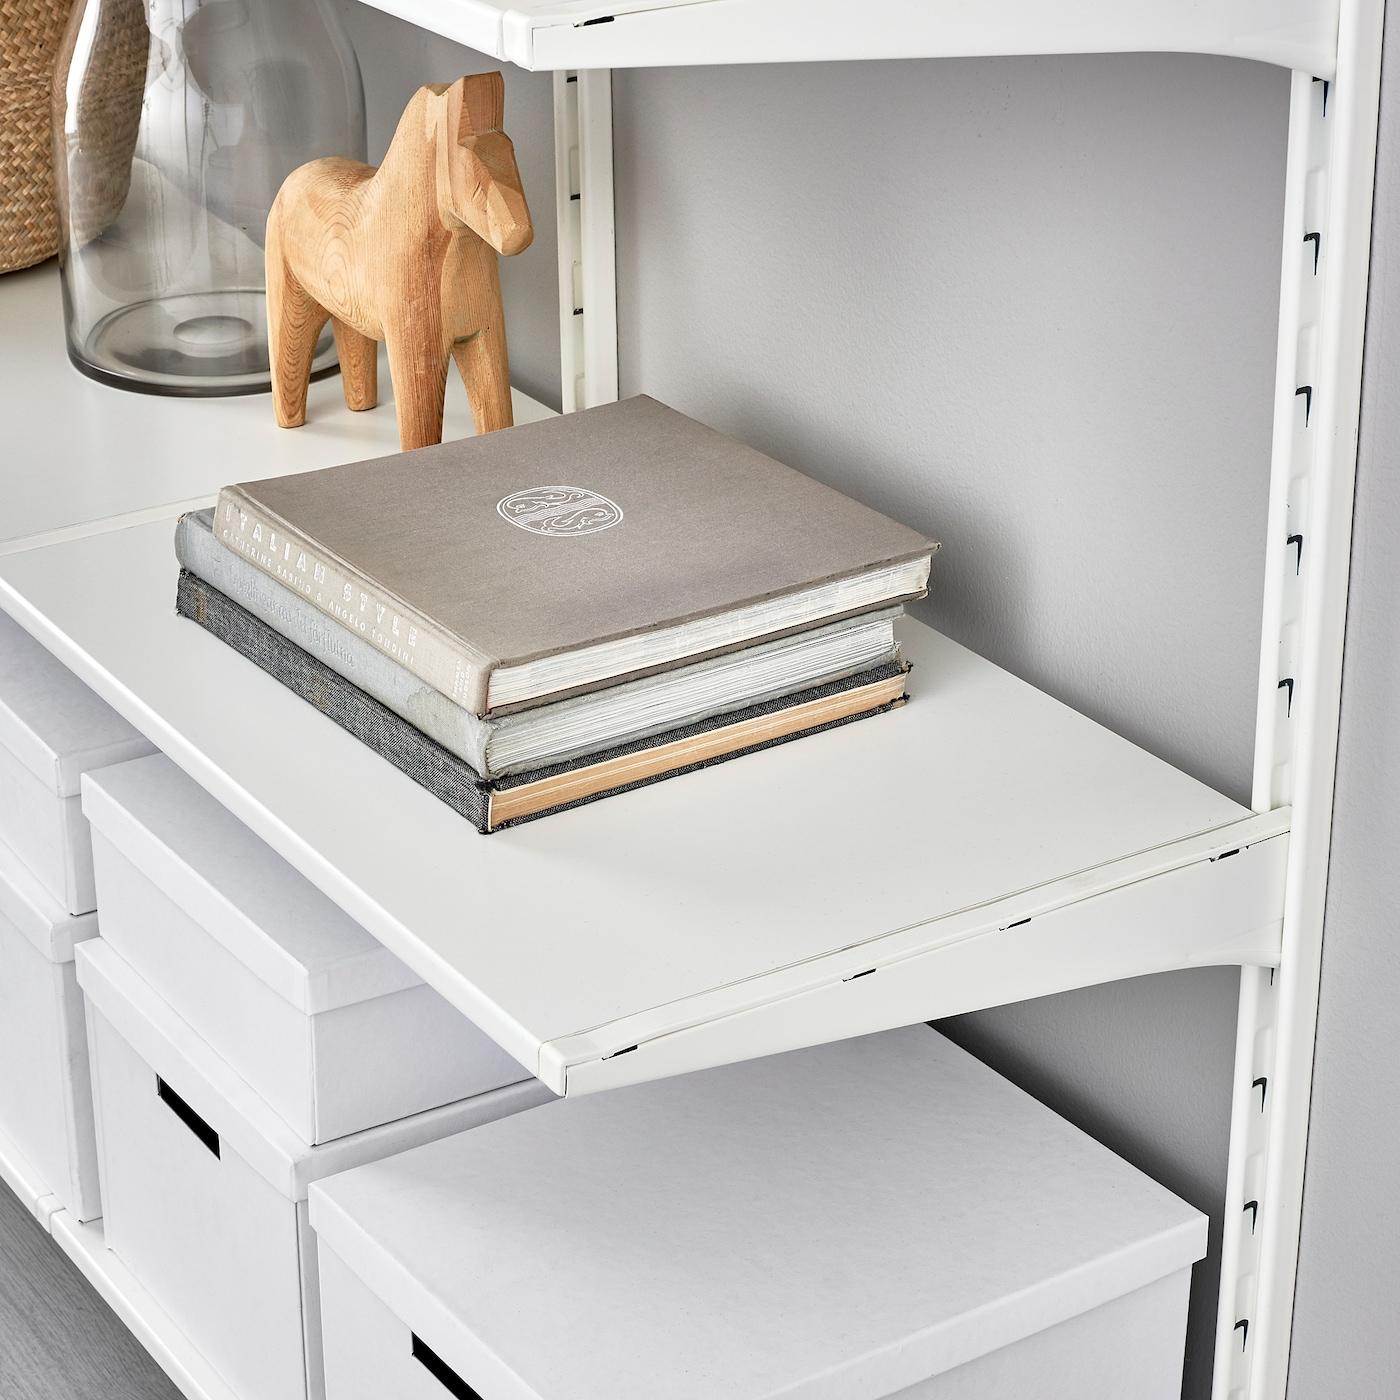 Algot Wandschiene Boden Weiss Ikea Schweiz